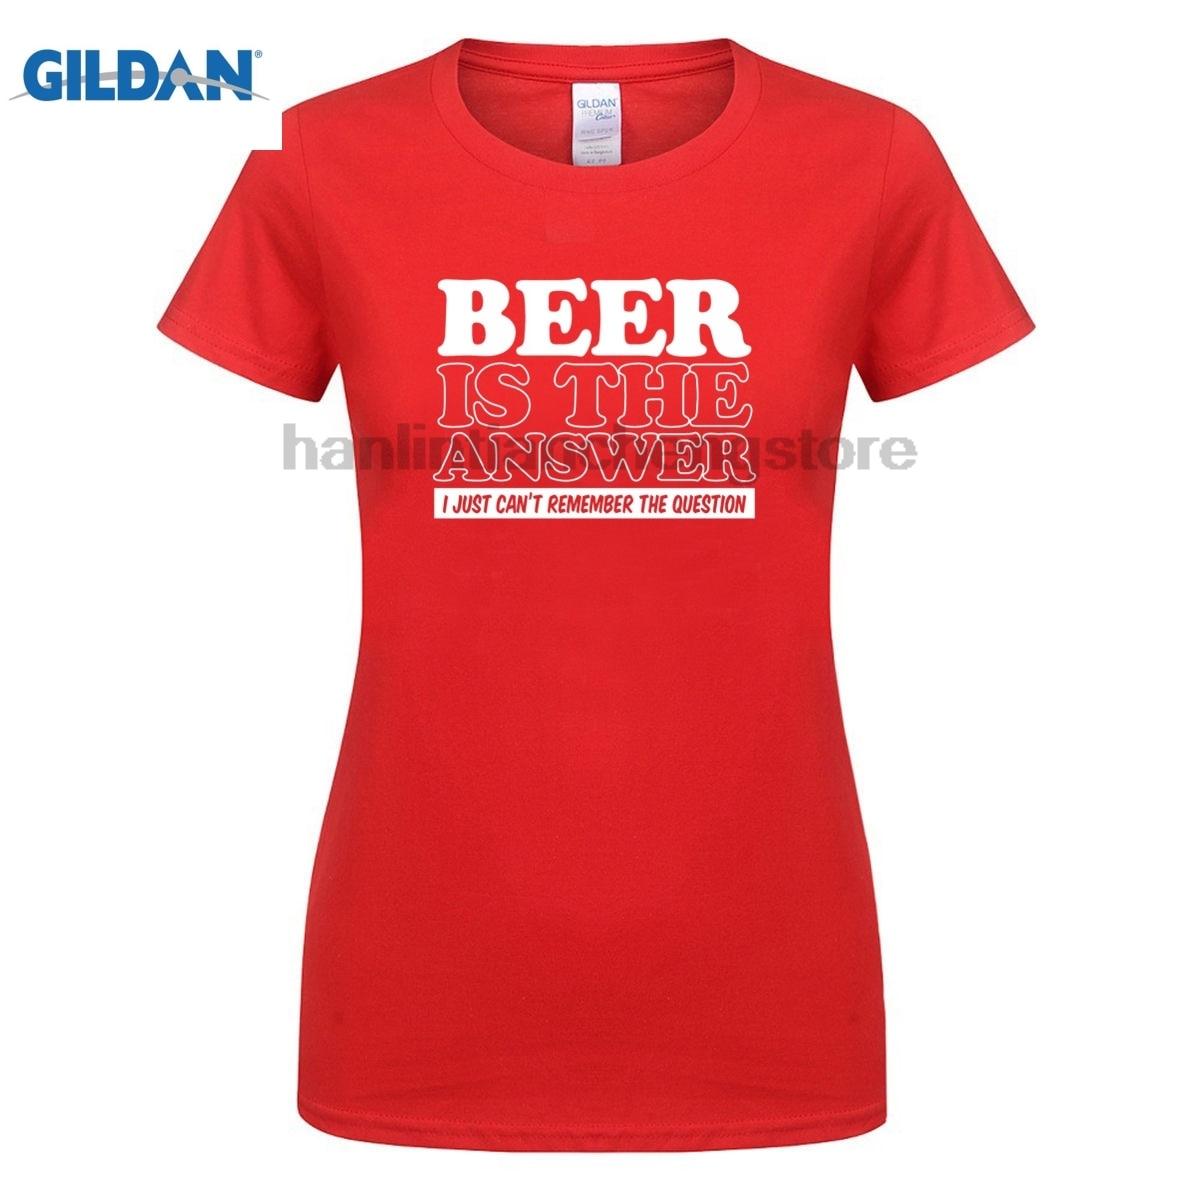 GILDAN Biere Is The Answer Drole T-Shirt Pour Hommes Papa Fete Des Peres CAMRA Real Ale Summer Style women T Shirt for women